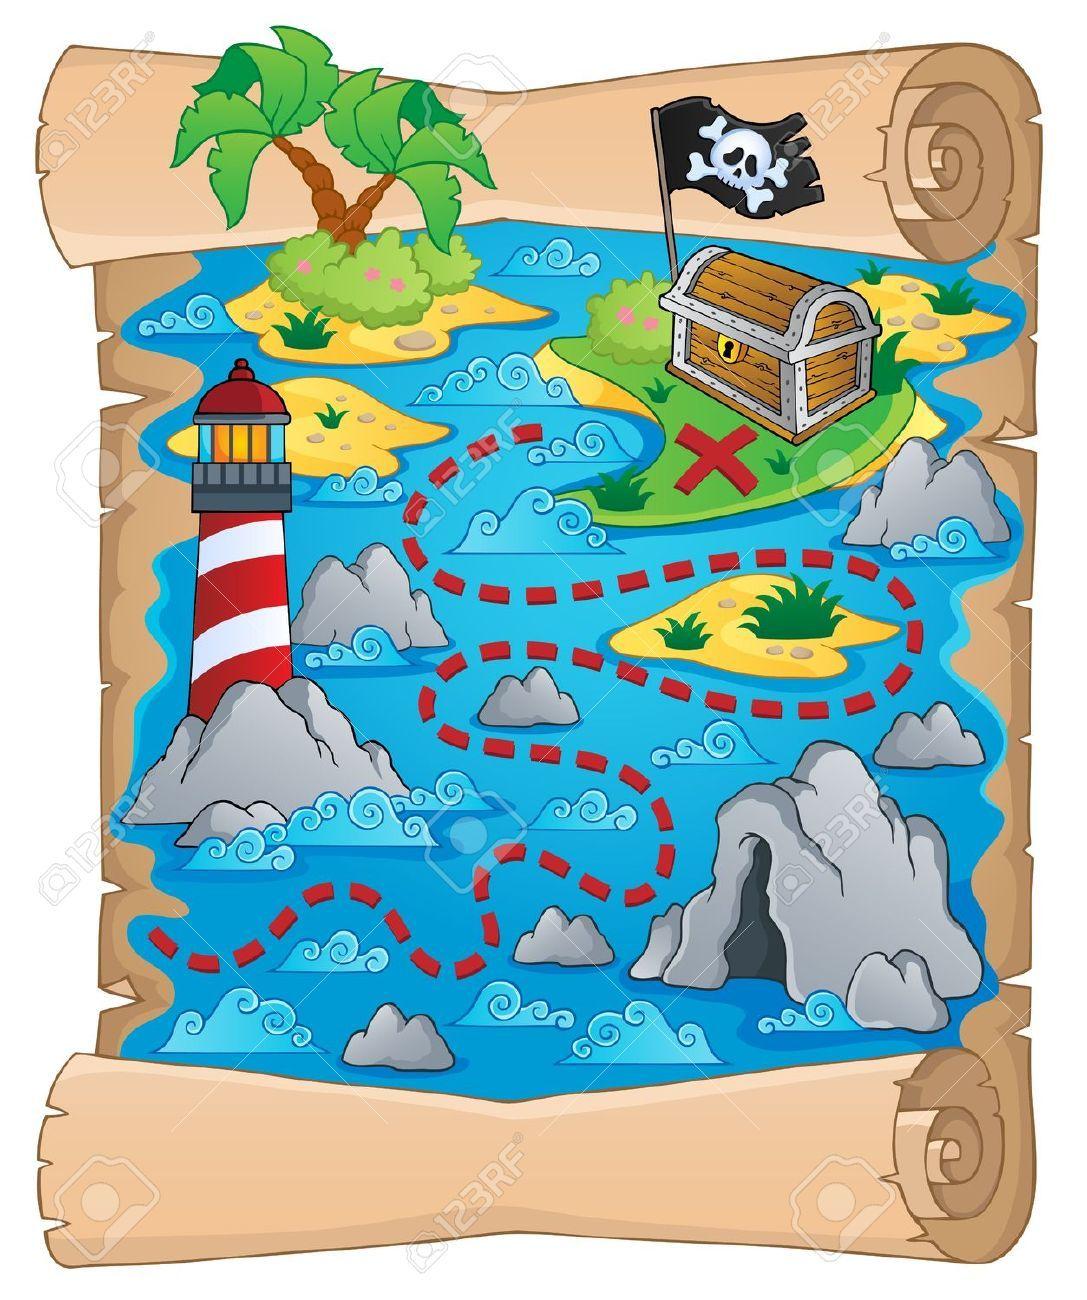 18559651 Mappa Del Tesoro Tema Archivio Fotografico Jpg 1087 1300 Mapas De Piratas Piratas Infantiles Tema Del Pirata